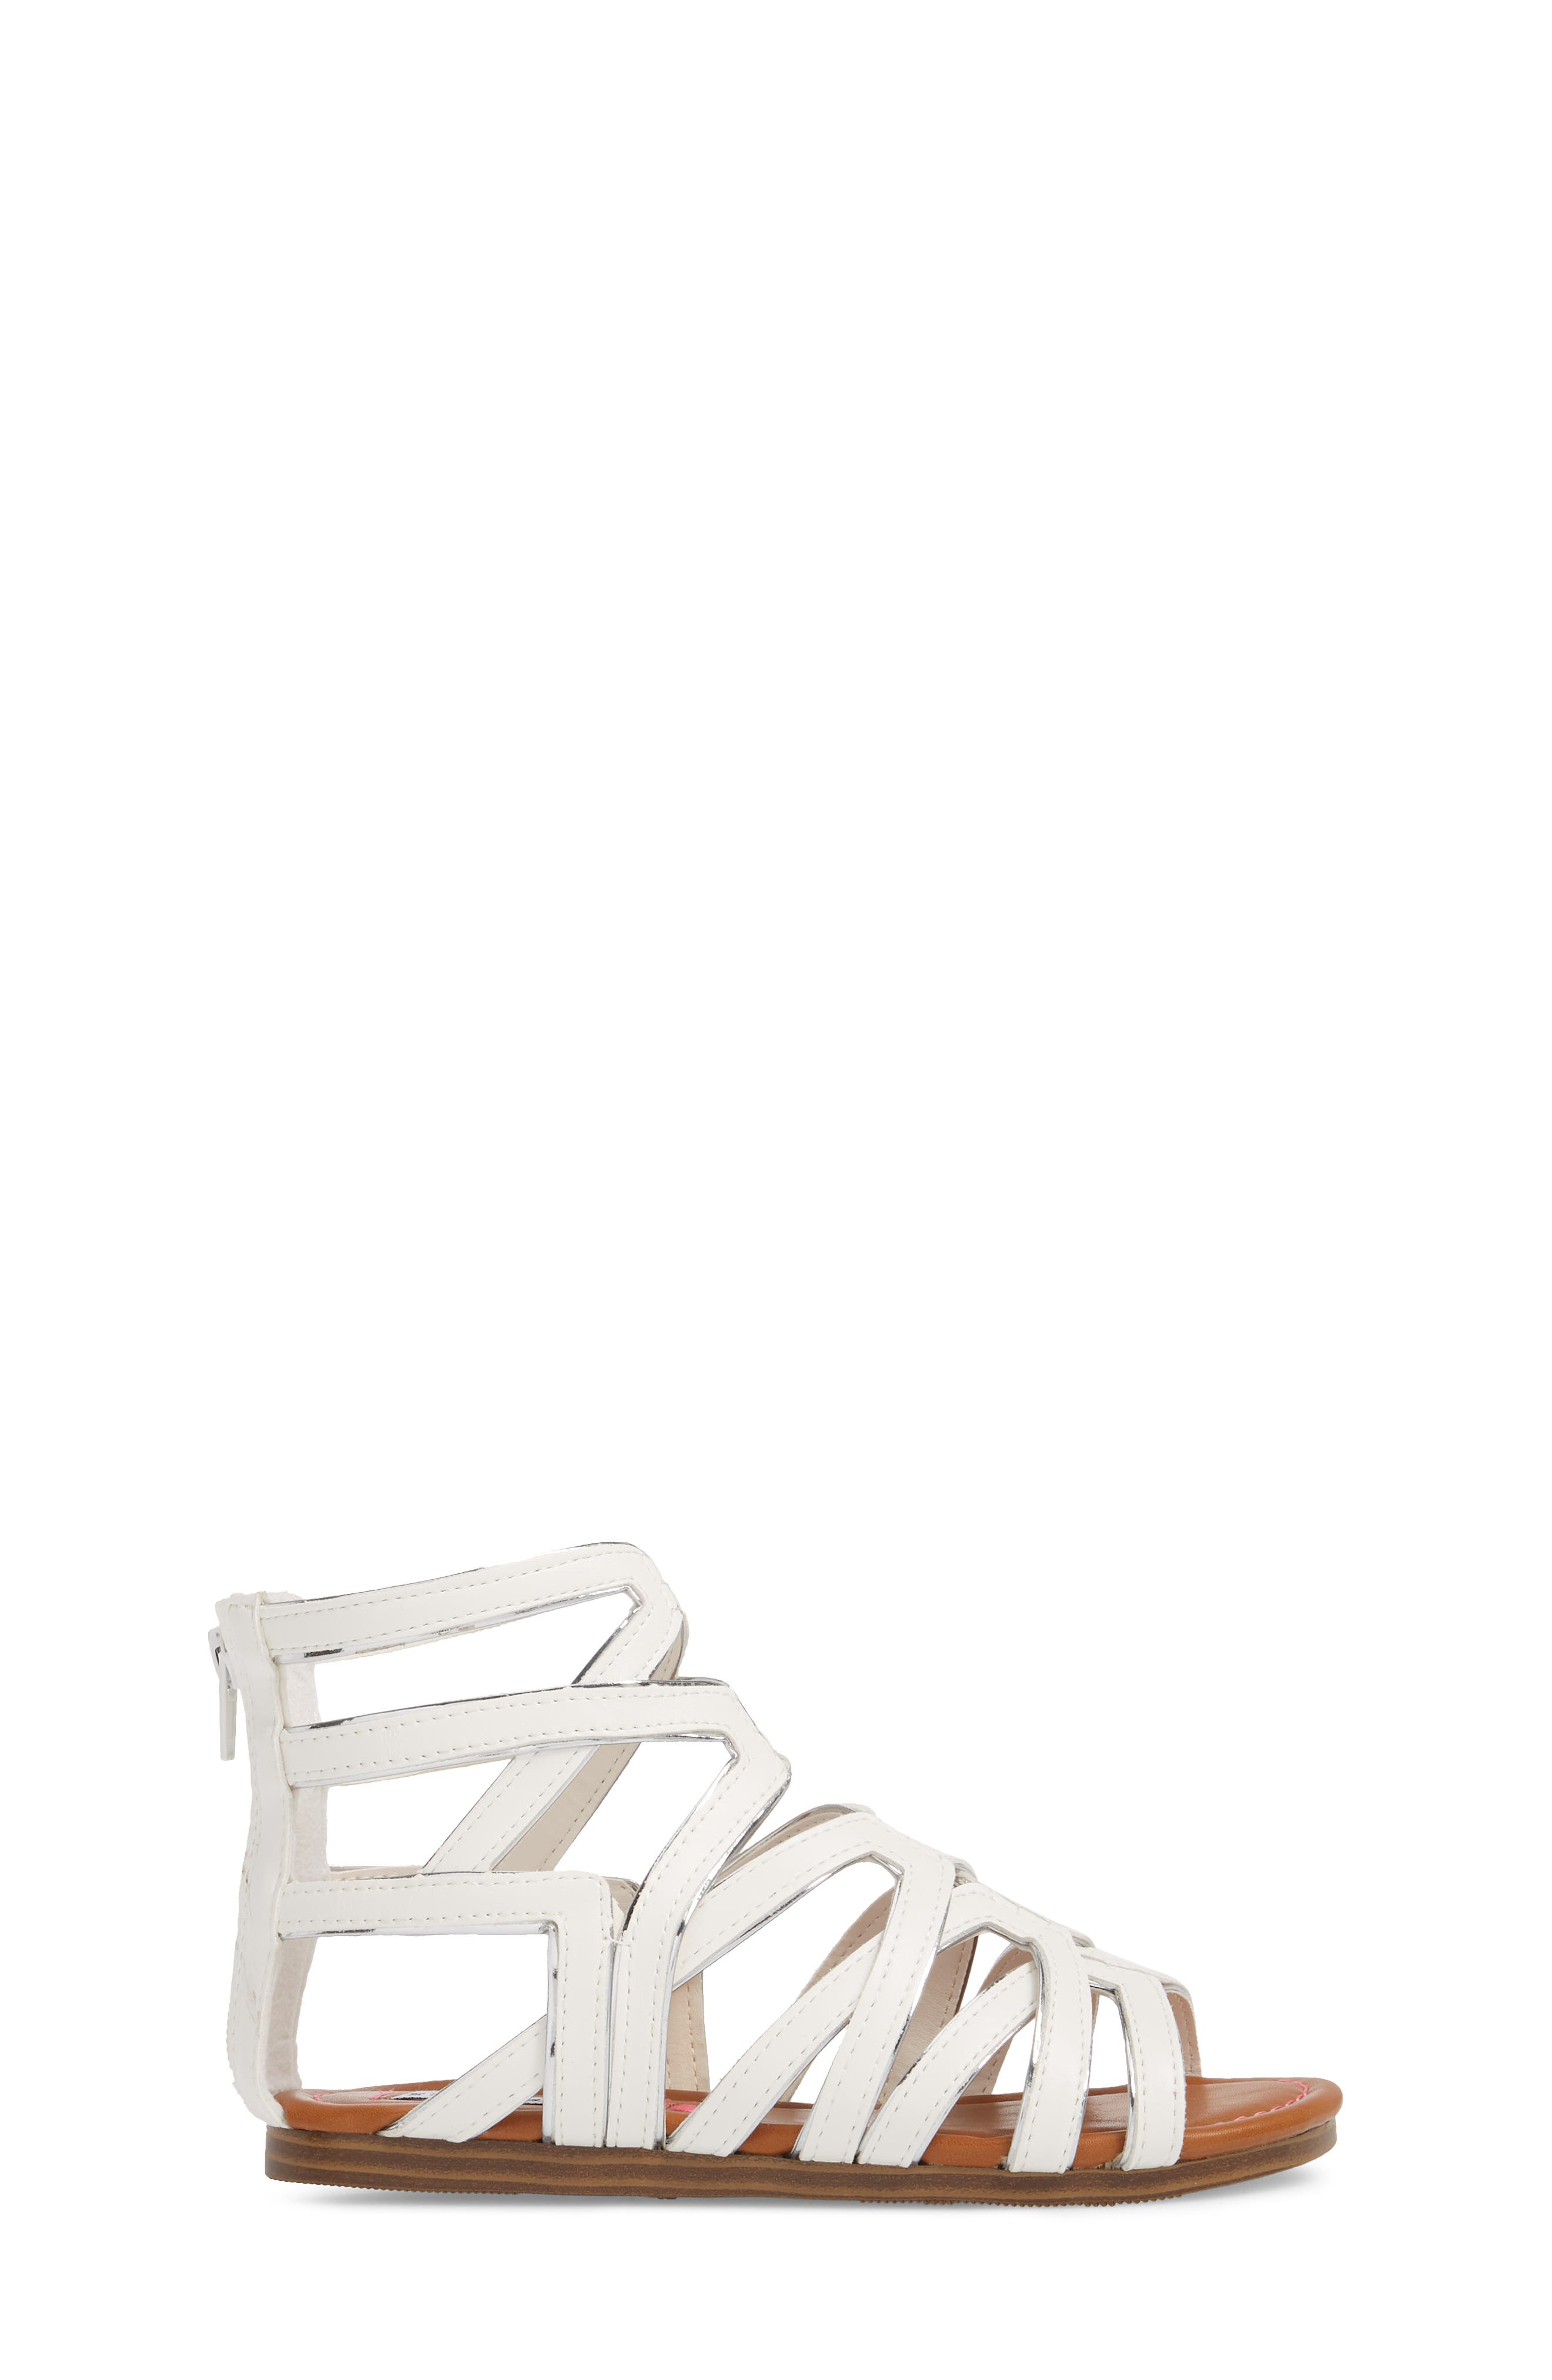 Jessence Gladiator Sandal,                             Alternate thumbnail 3, color,                             White